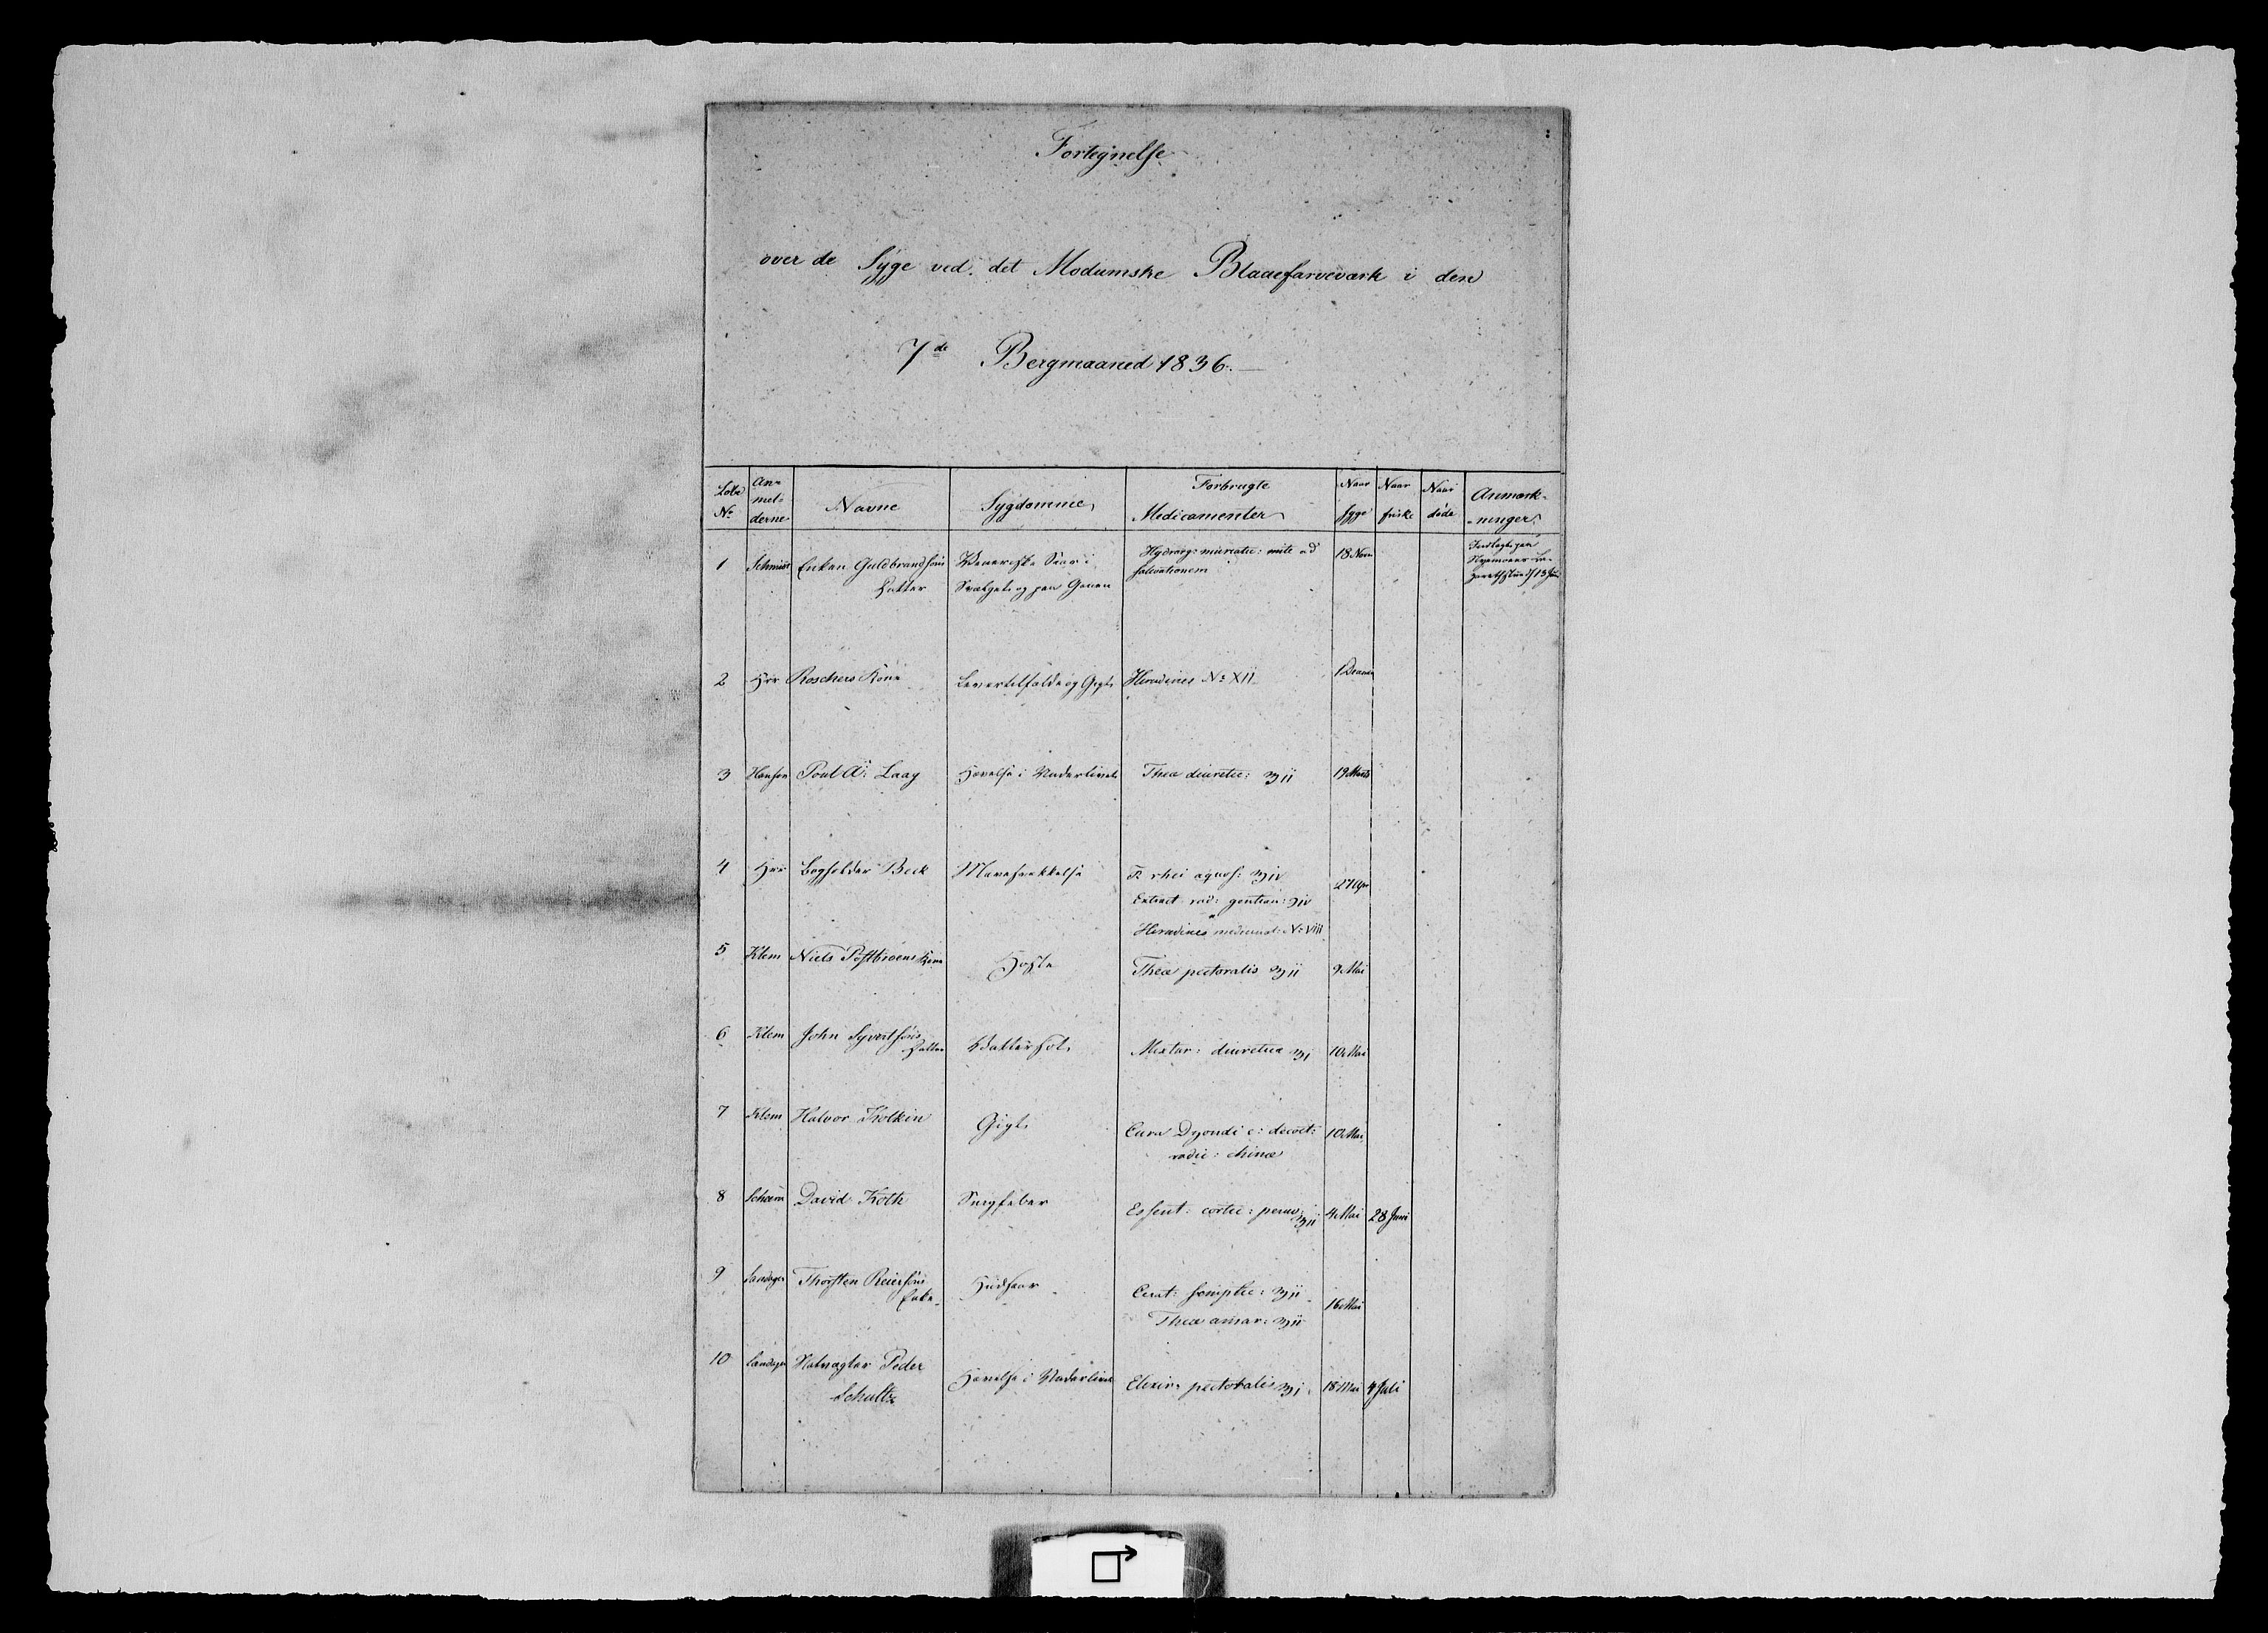 RA, Modums Blaafarveværk, G/Gh/L0378, 1836-1840, s. 2